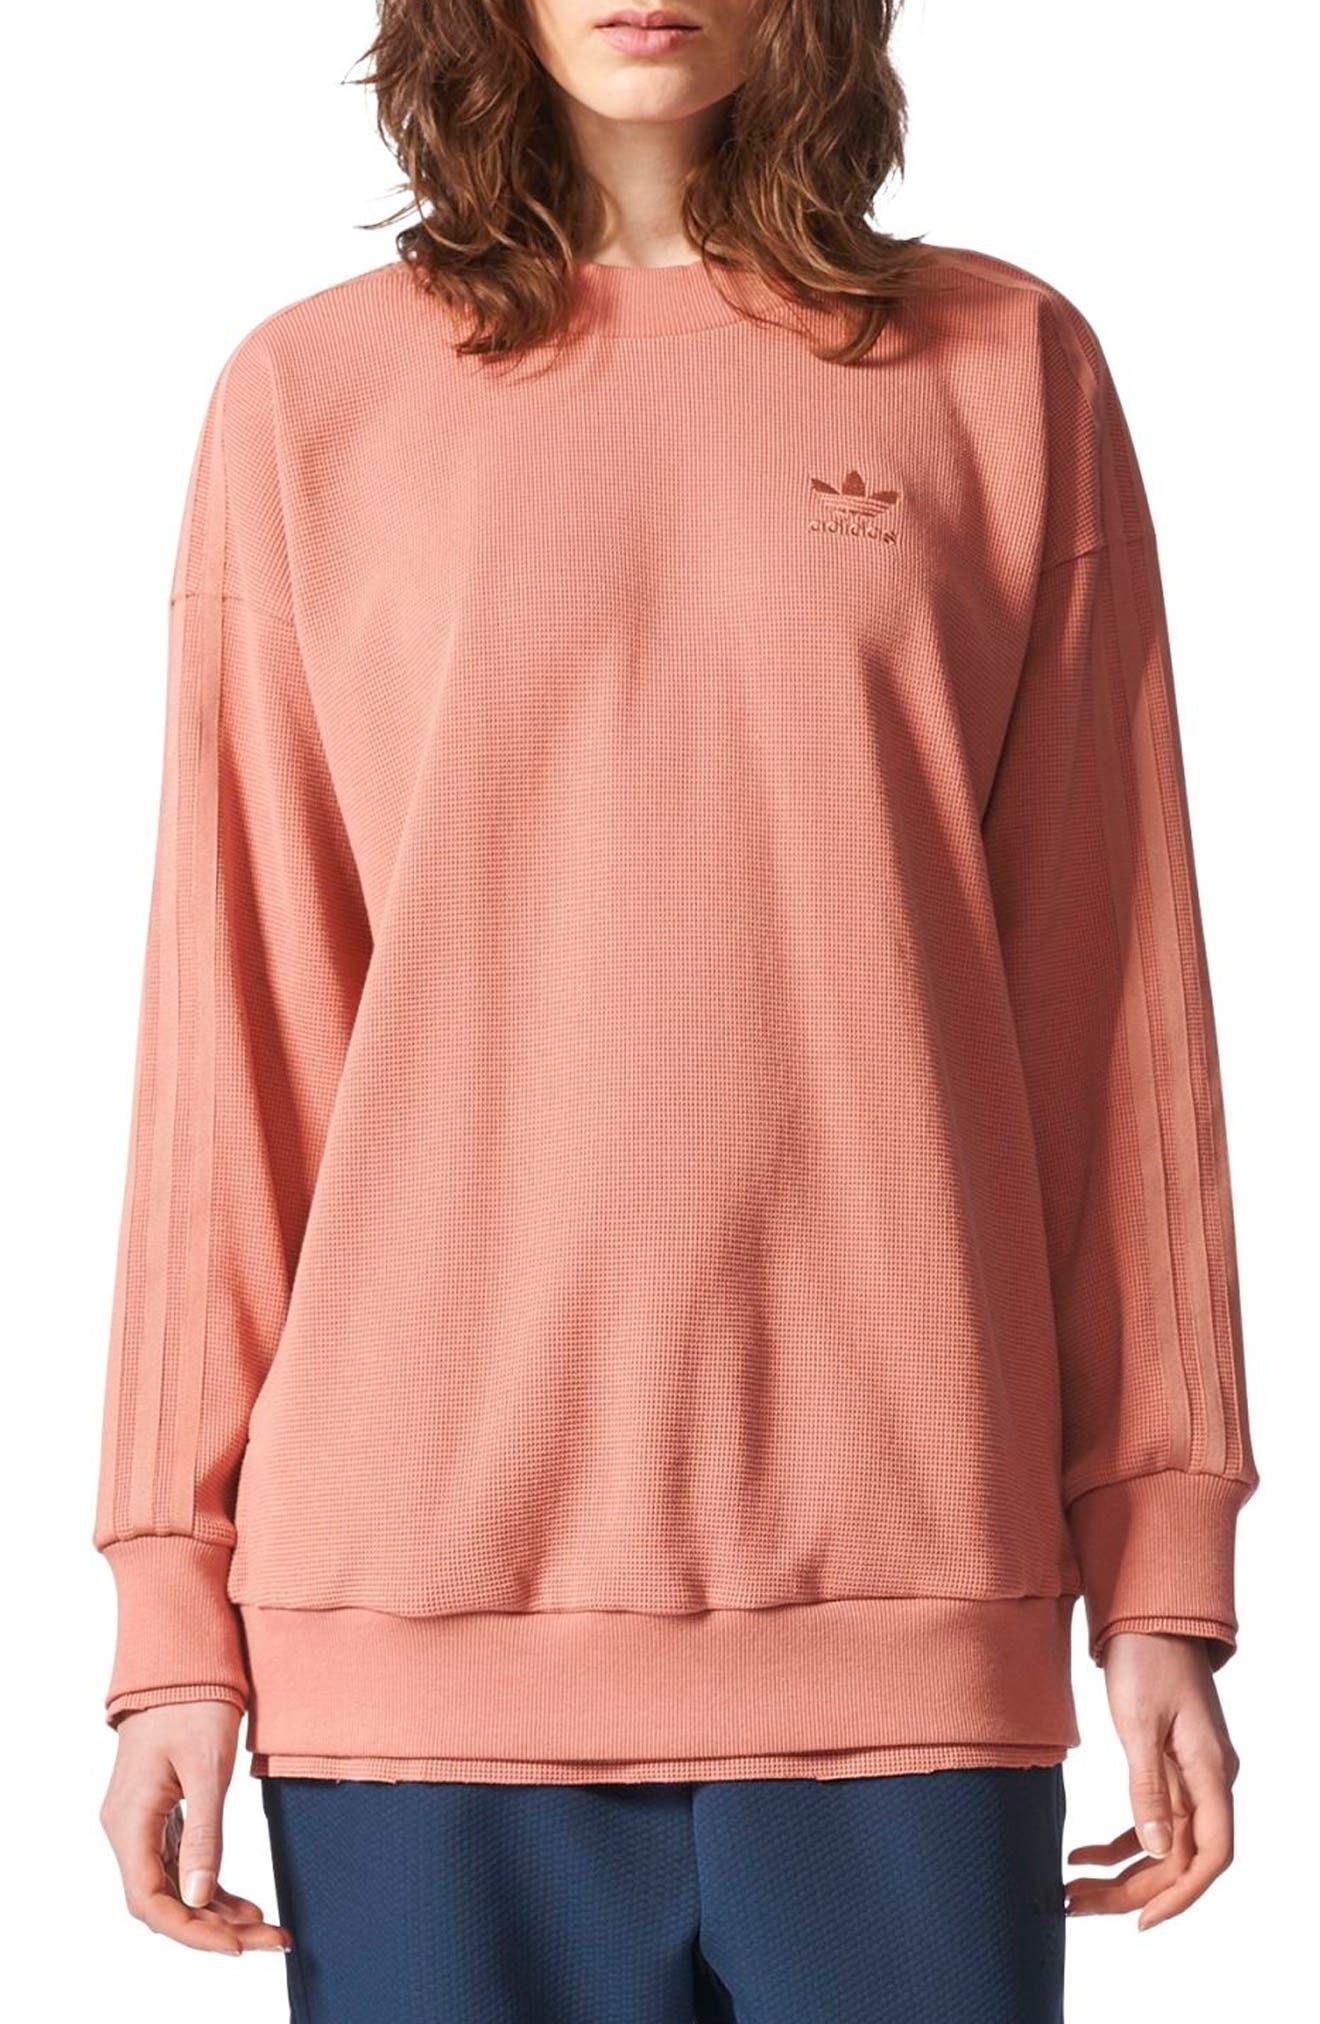 Main Image - adidas Originals Thermal Sweatshirt